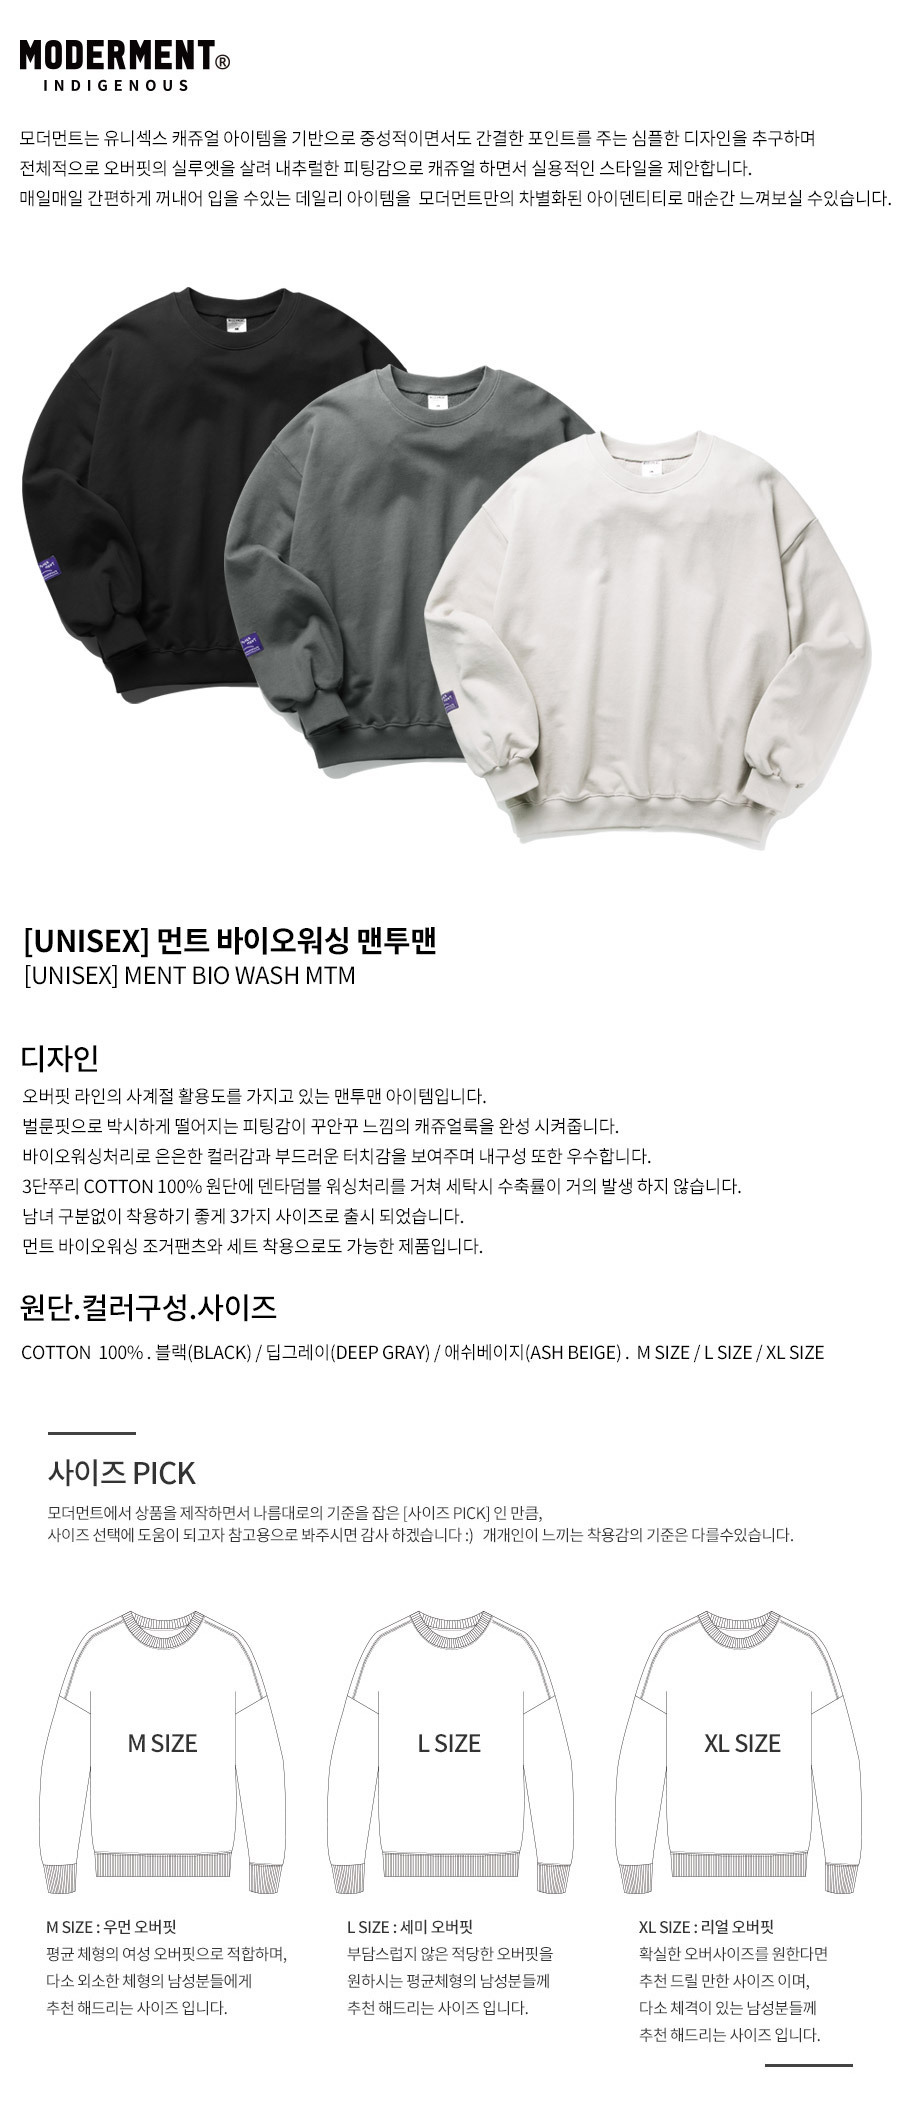 [UNISEX] 먼트 바이오워싱 맨투맨 (블랙)